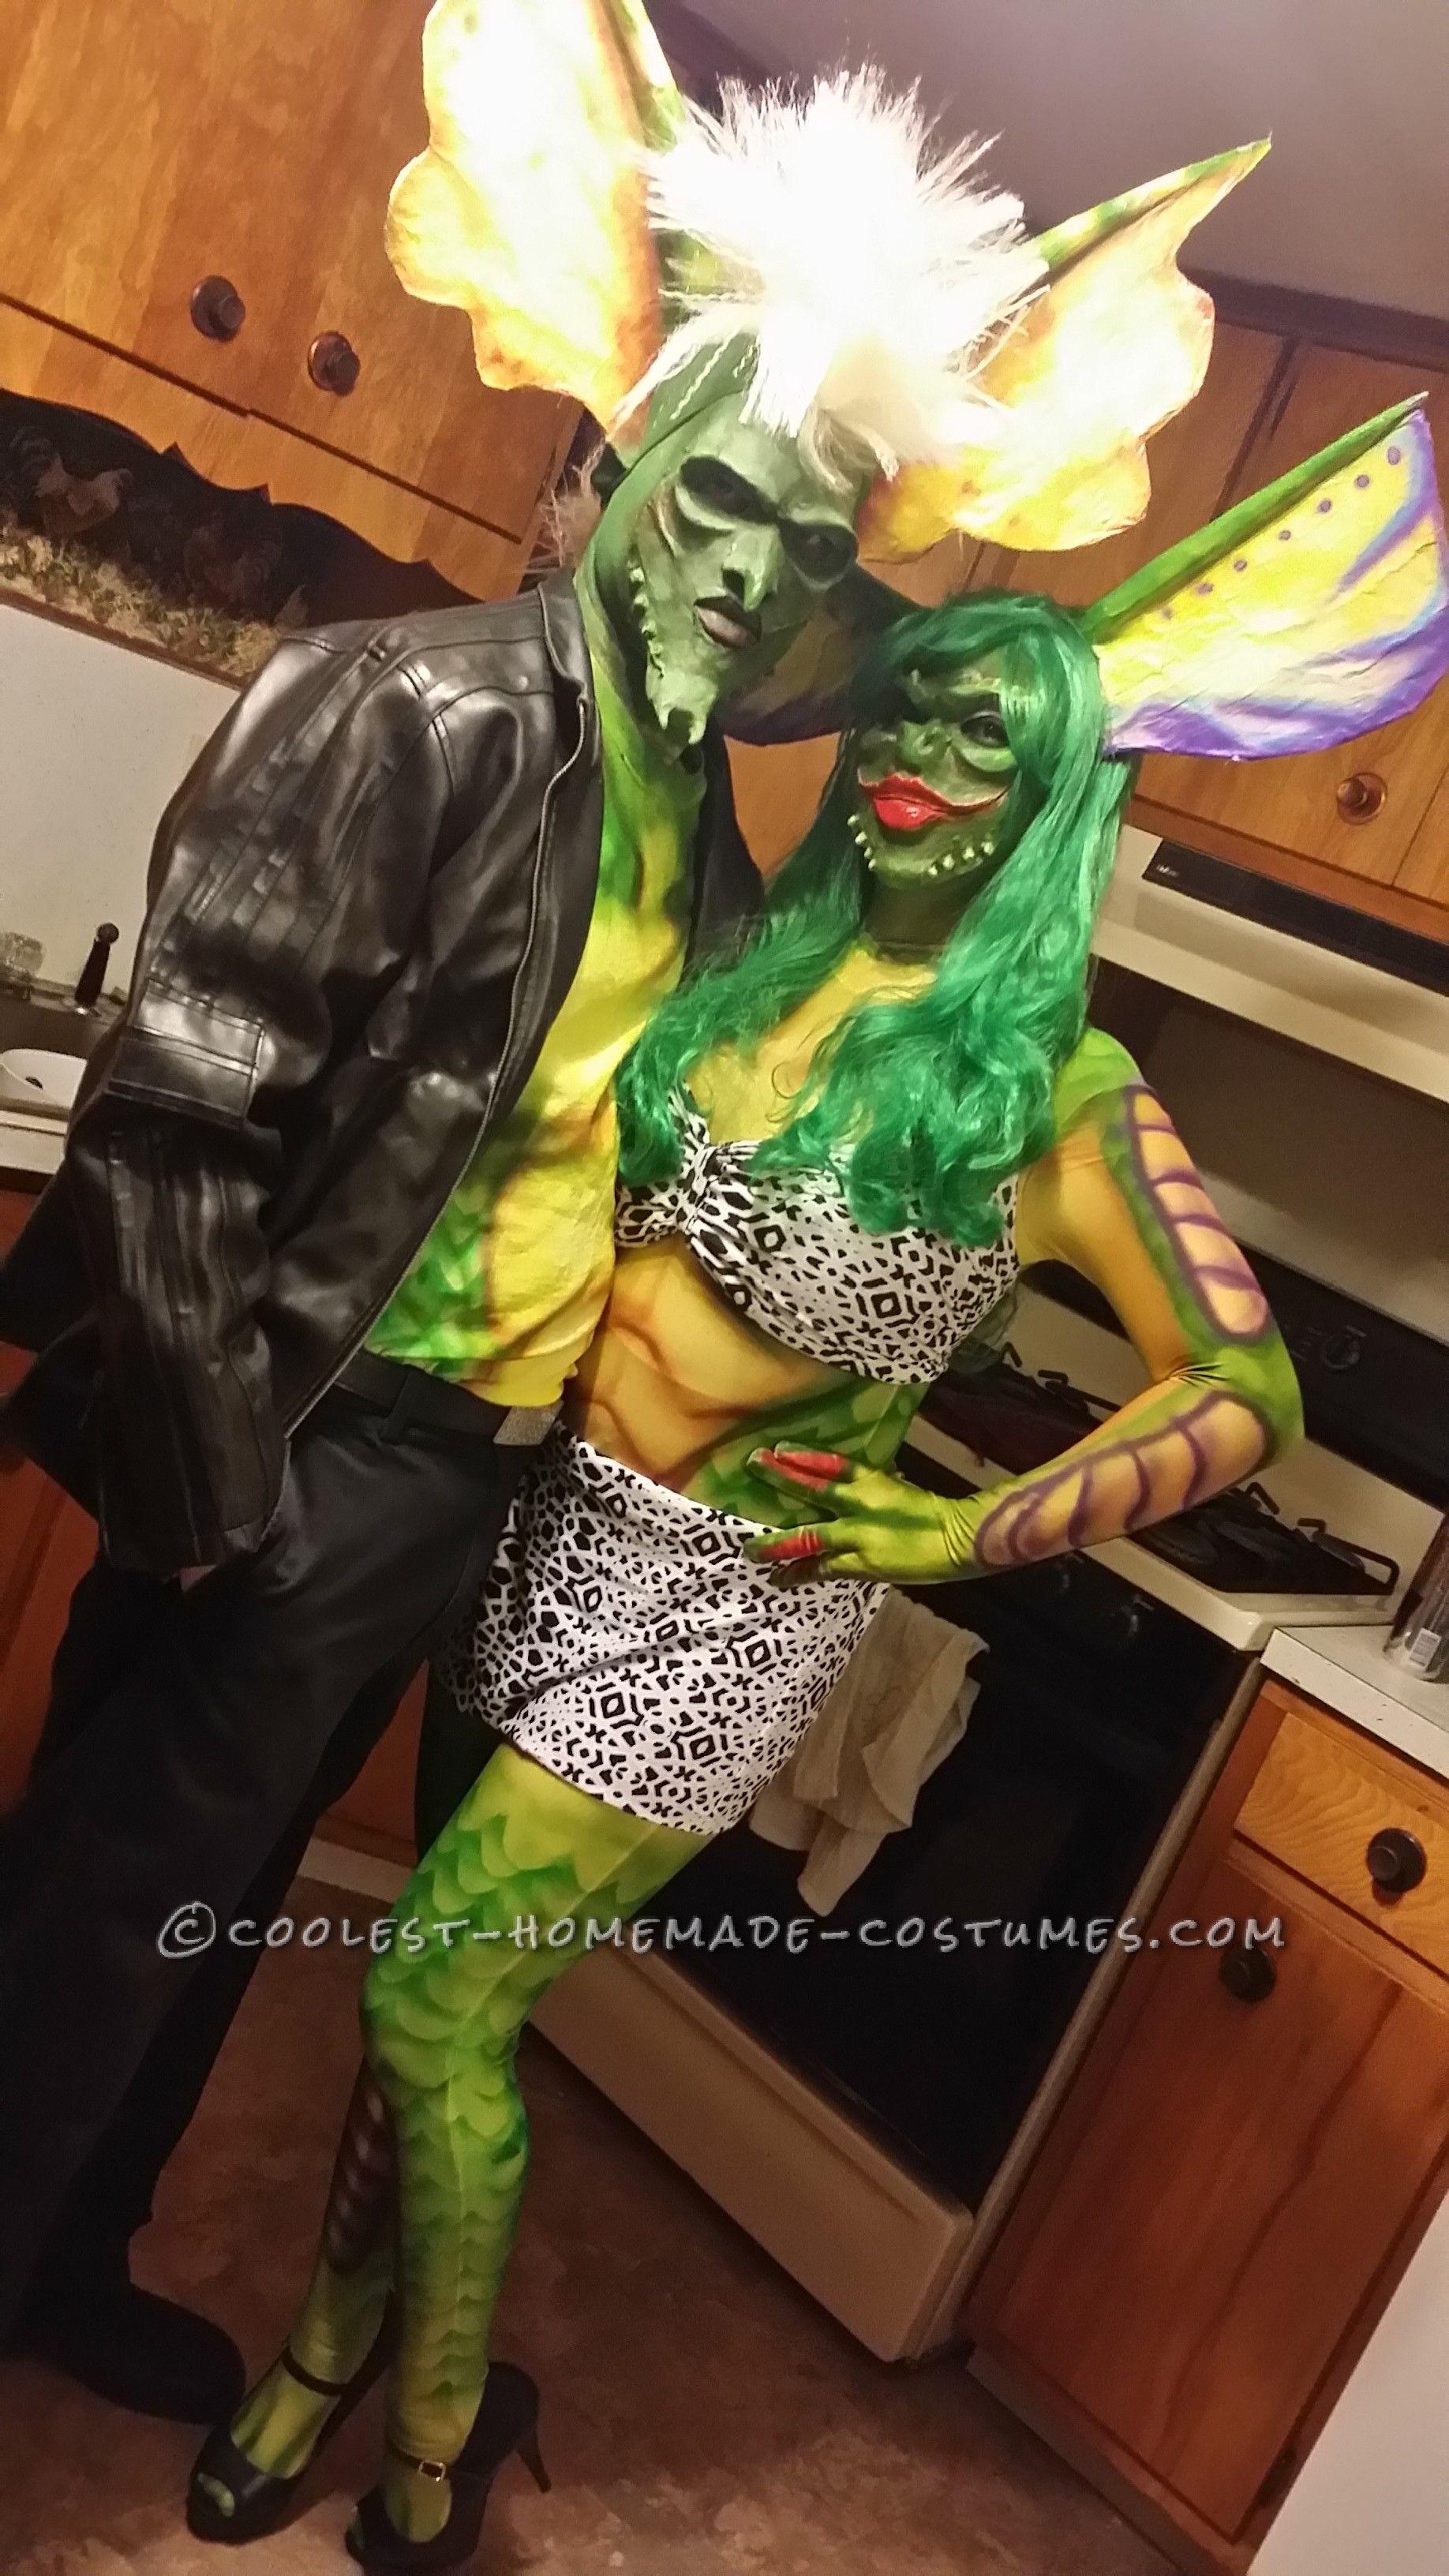 Coolest Homemade Gremlin Couple Costume   Halloween costume ...